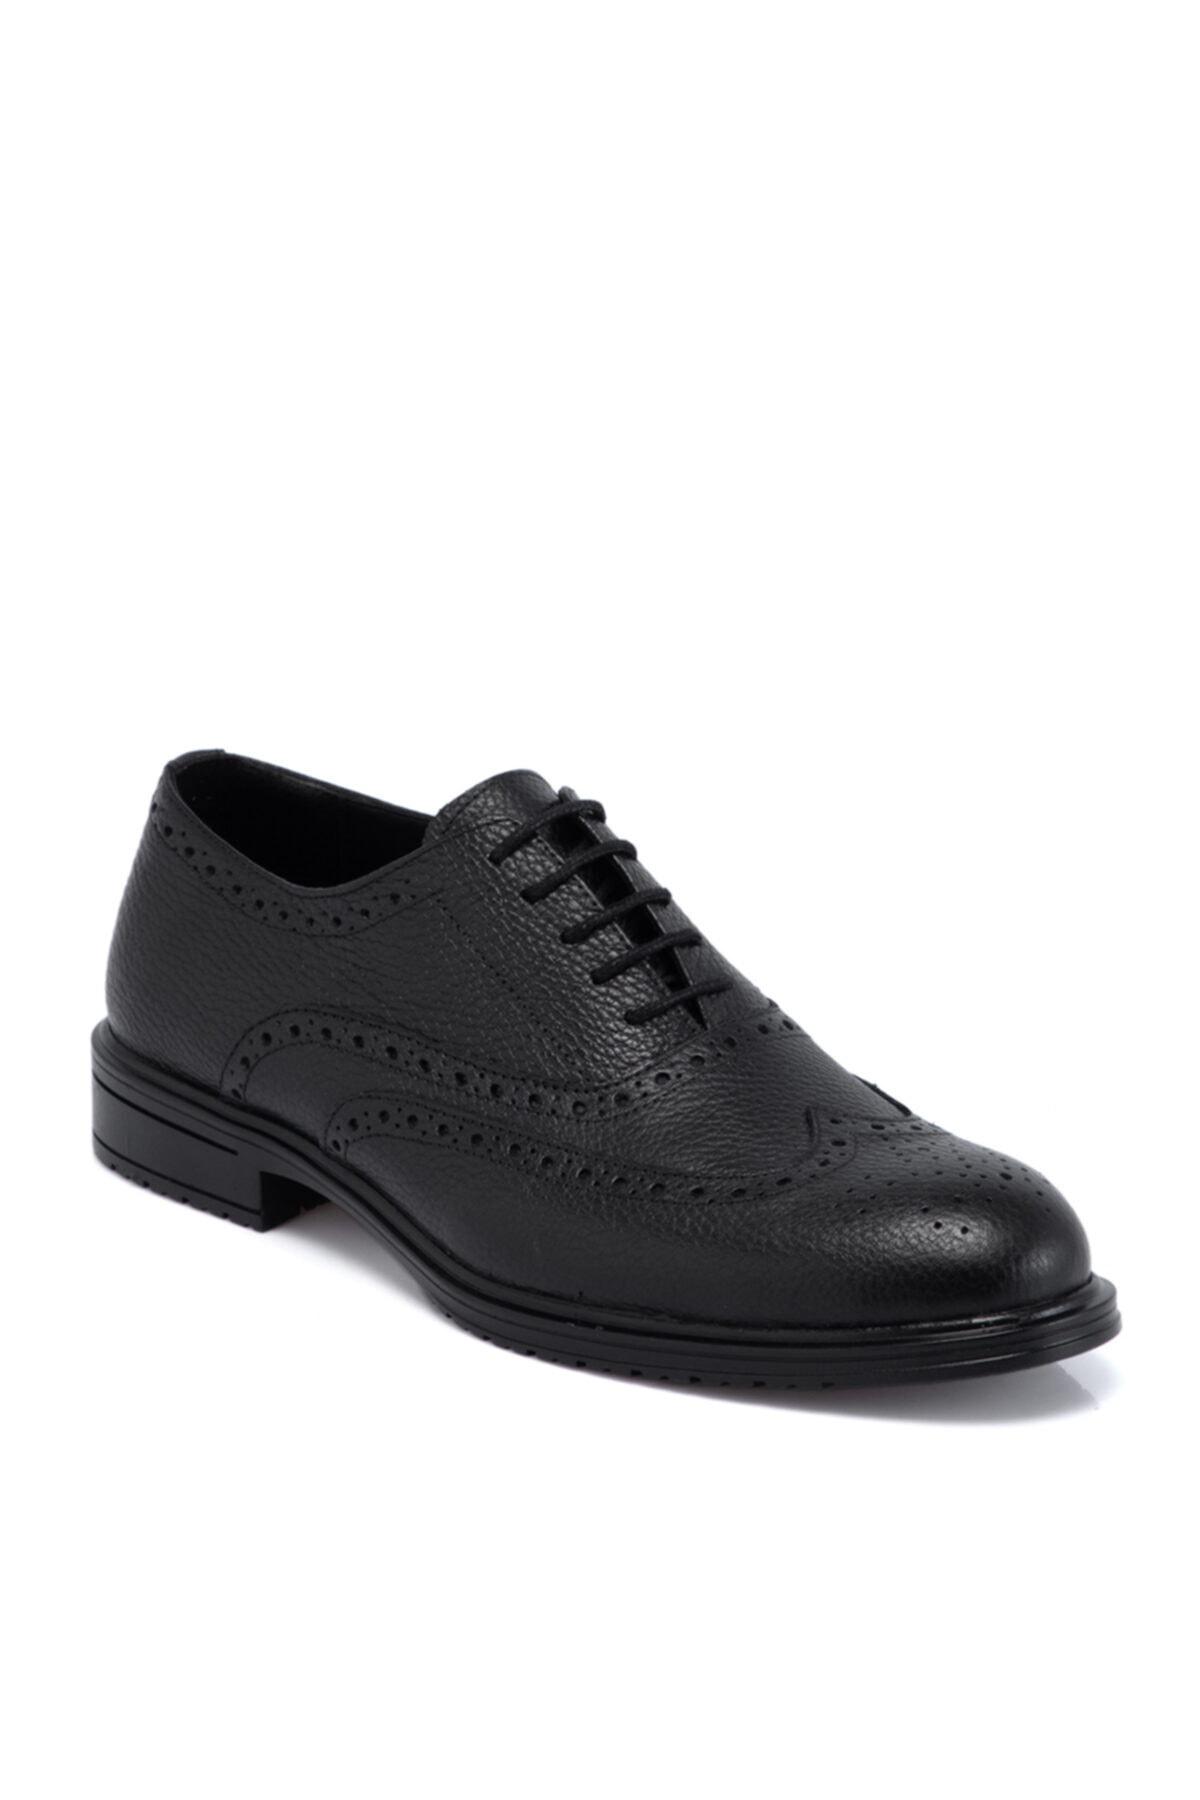 Tergan Siyah Deri Erkek Ayakkabı 55059a41 1